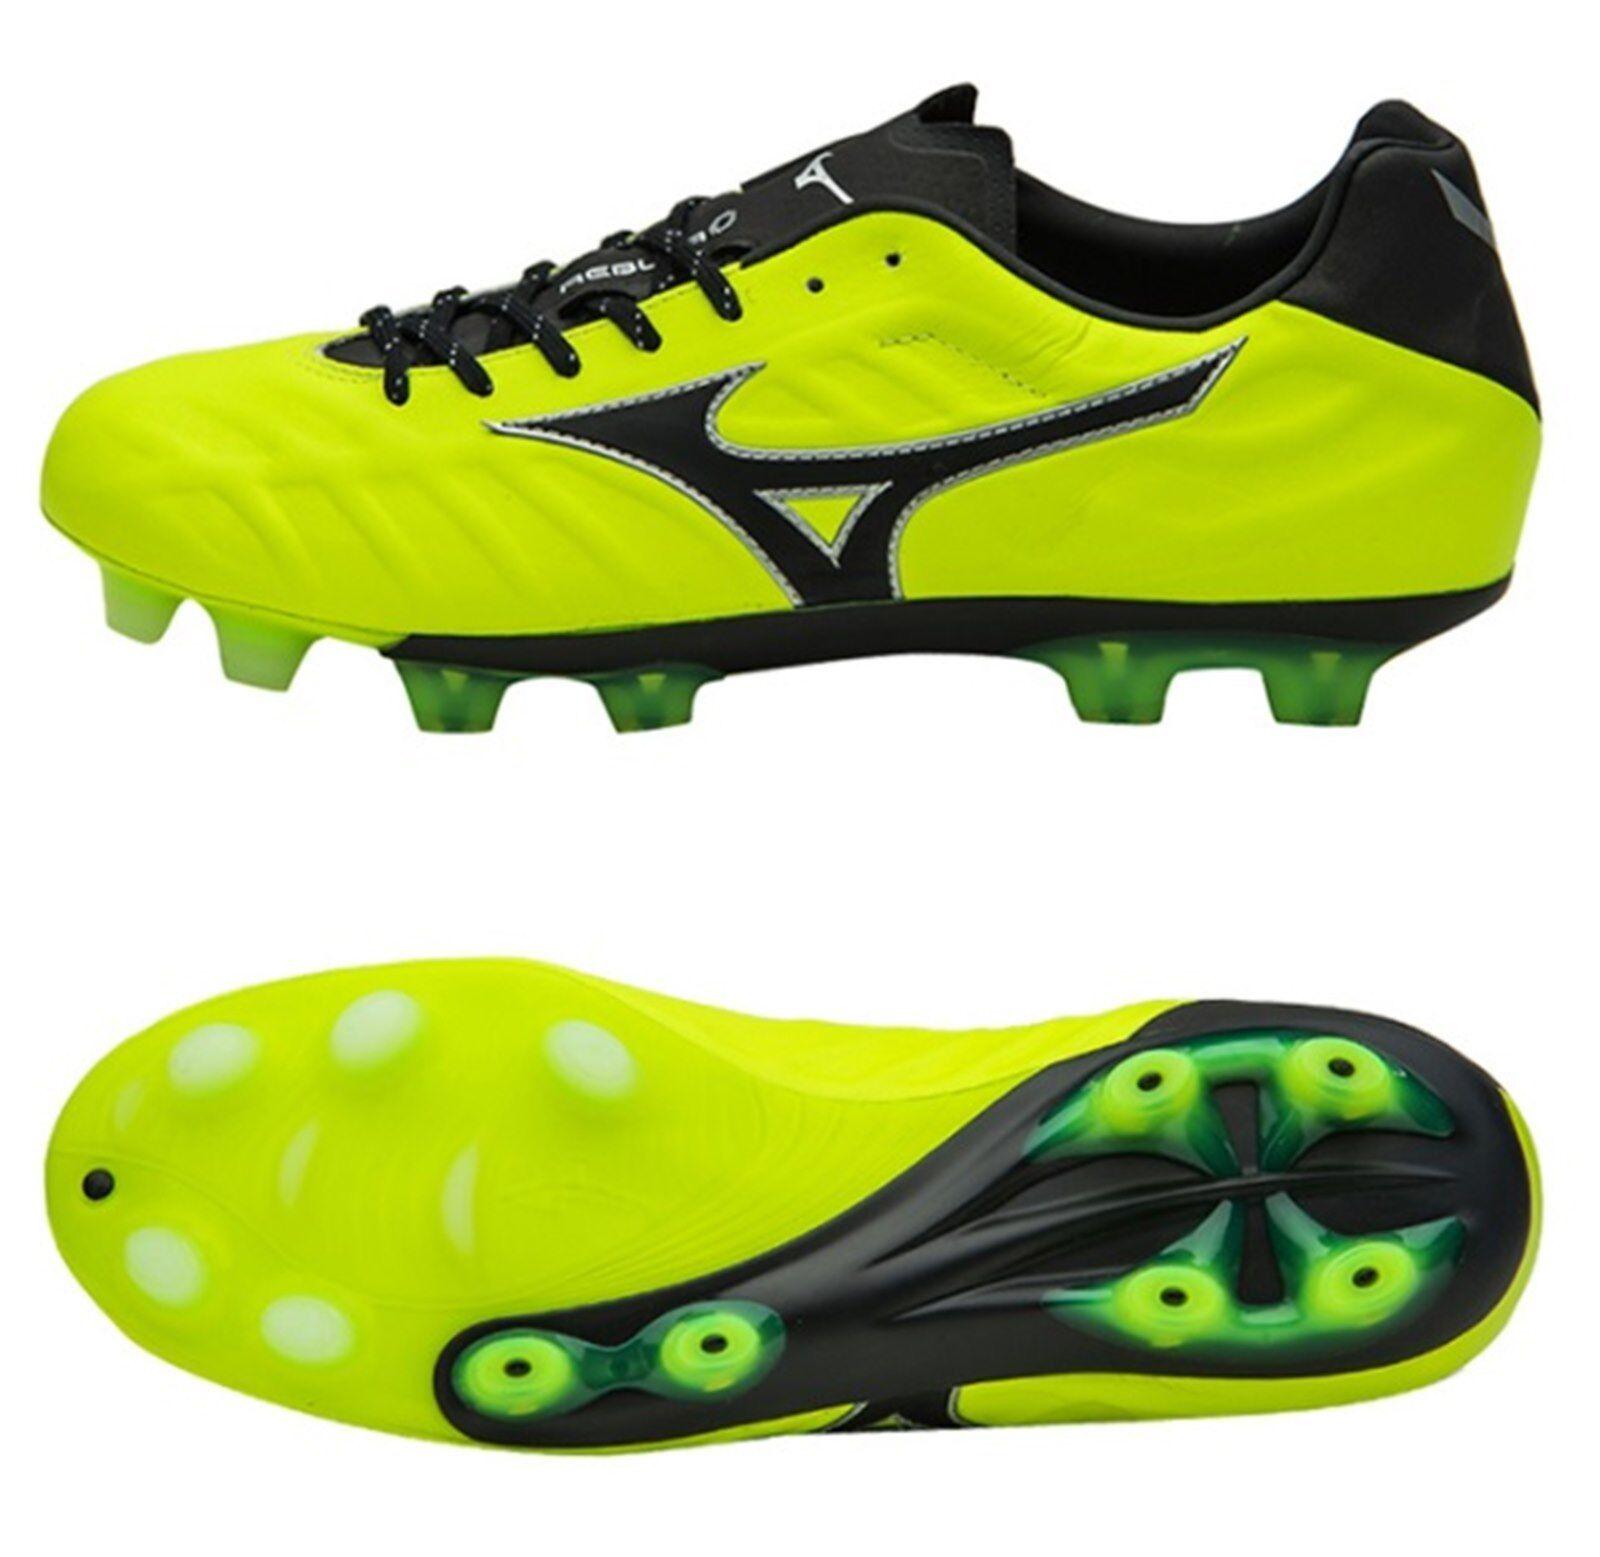 Mizuno Hombre Rebula V1 MD Tacos fútbol VOLT negro zapatos de fútbol Spike P1GA188145